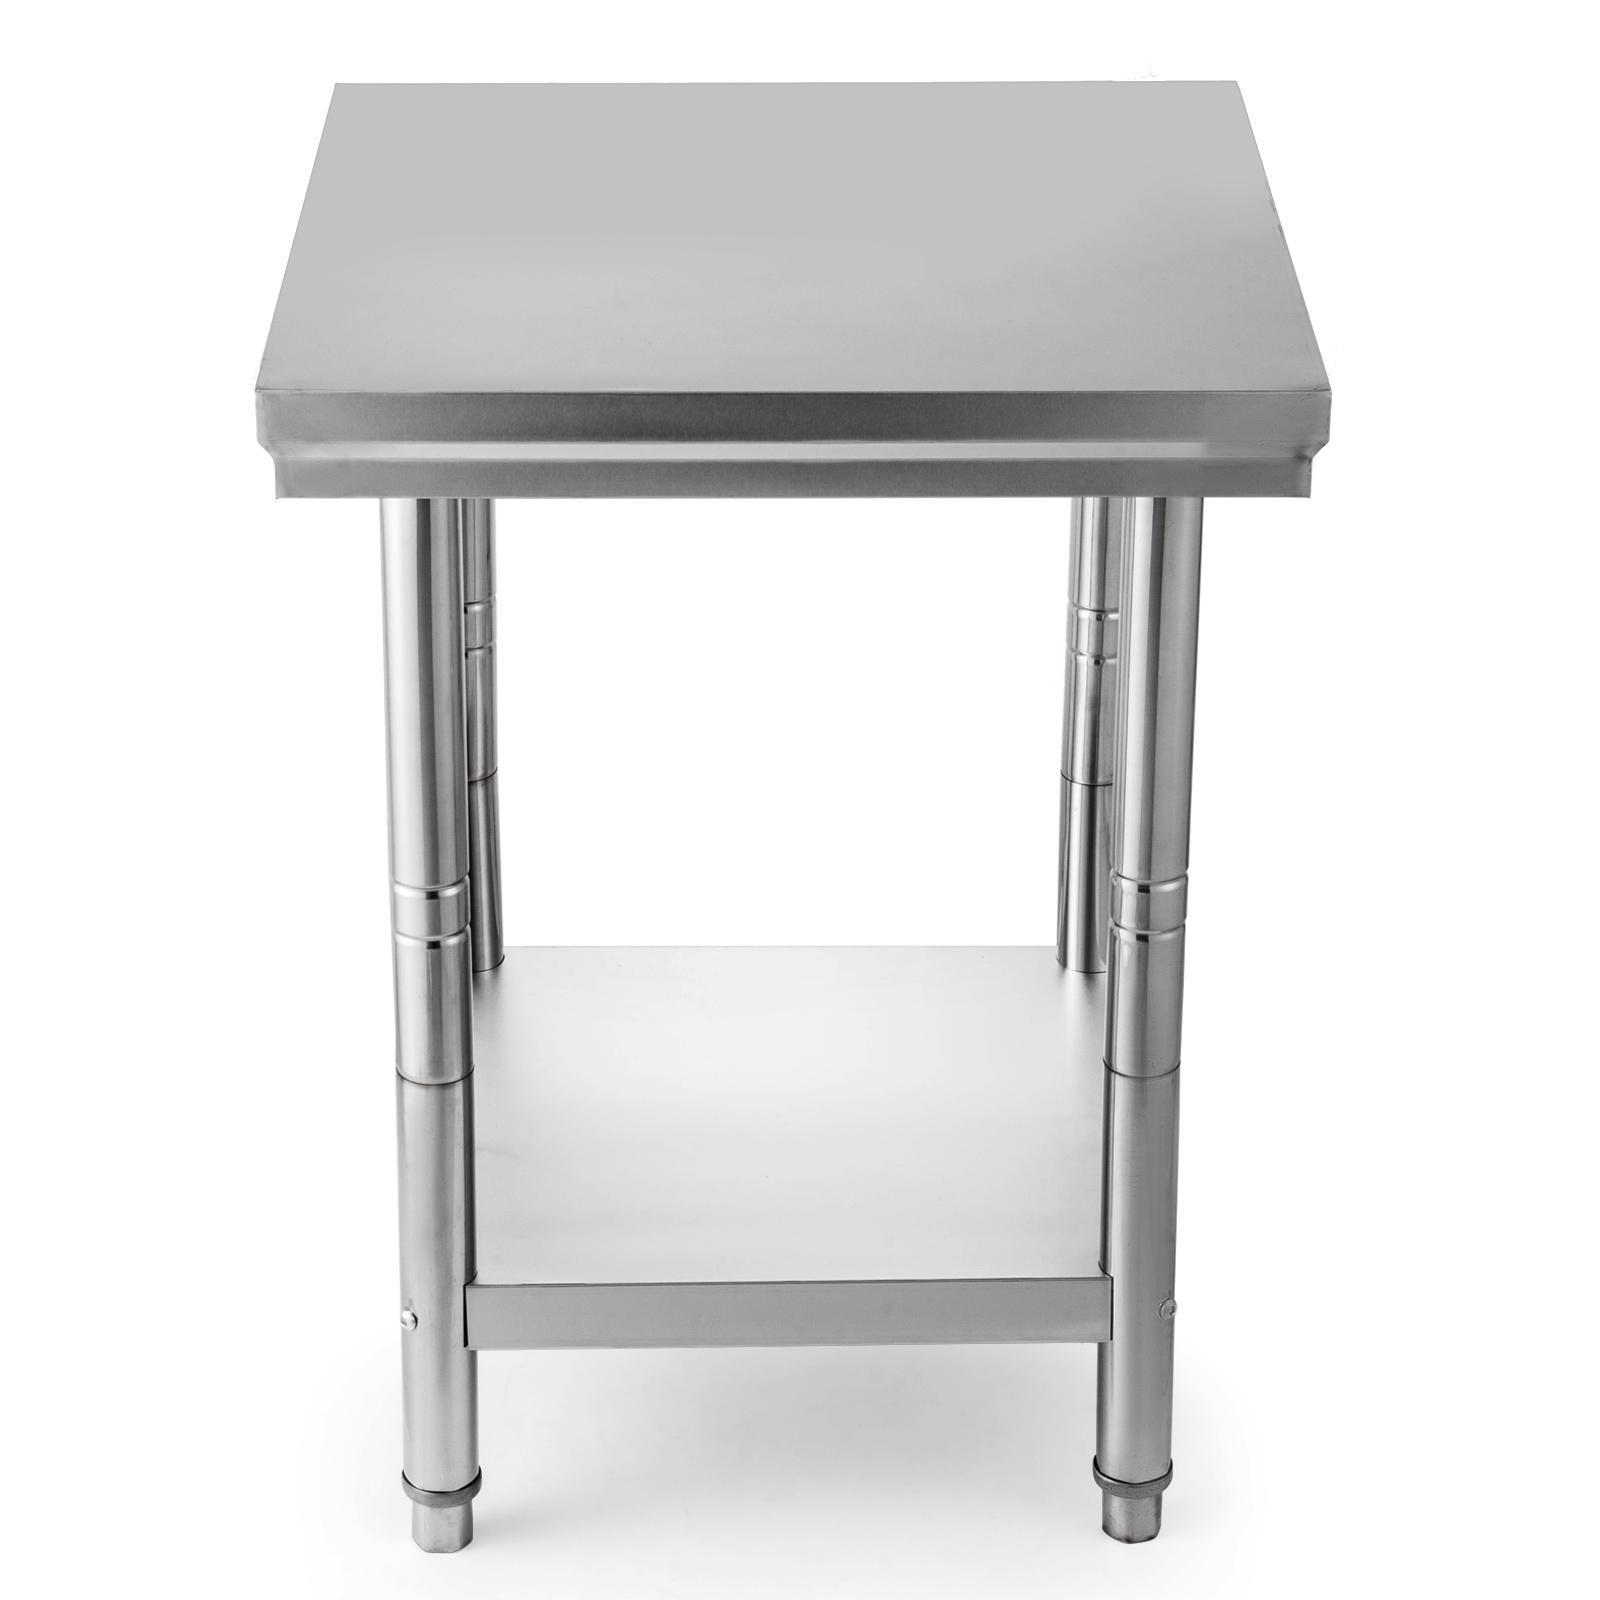 table acier inox plan travail restauration 60 x 60 cm. Black Bedroom Furniture Sets. Home Design Ideas